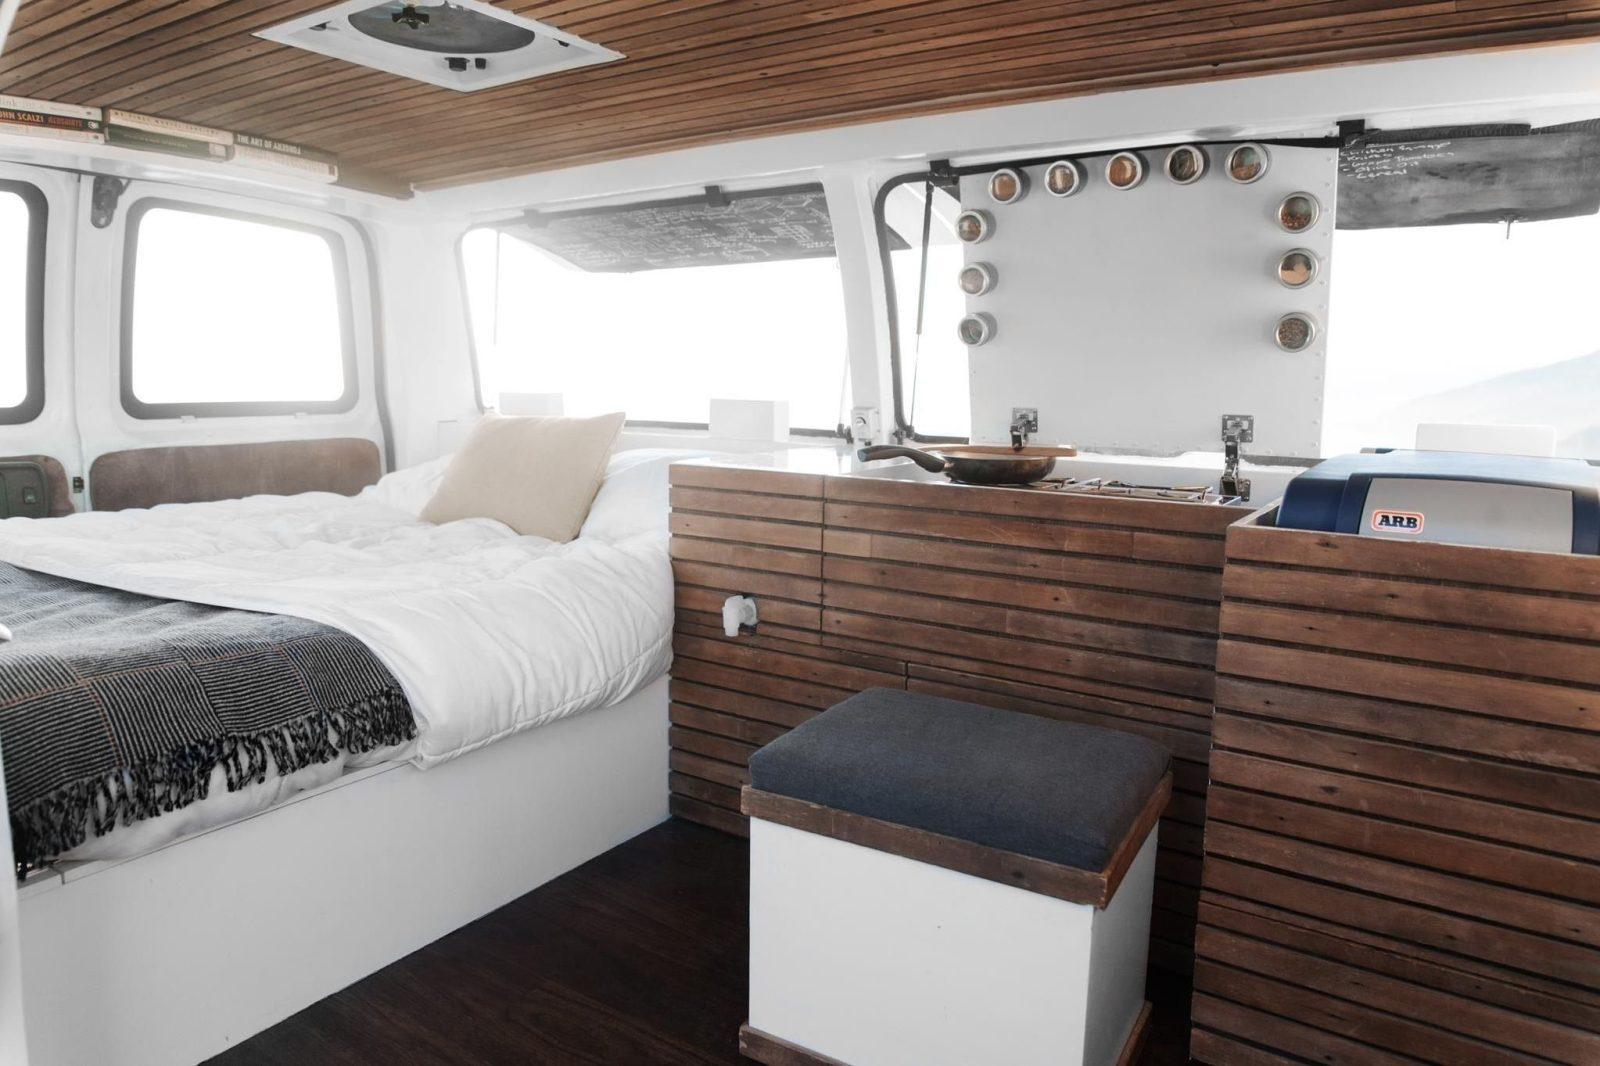 18 Simple Affordable Camper Van Conversion